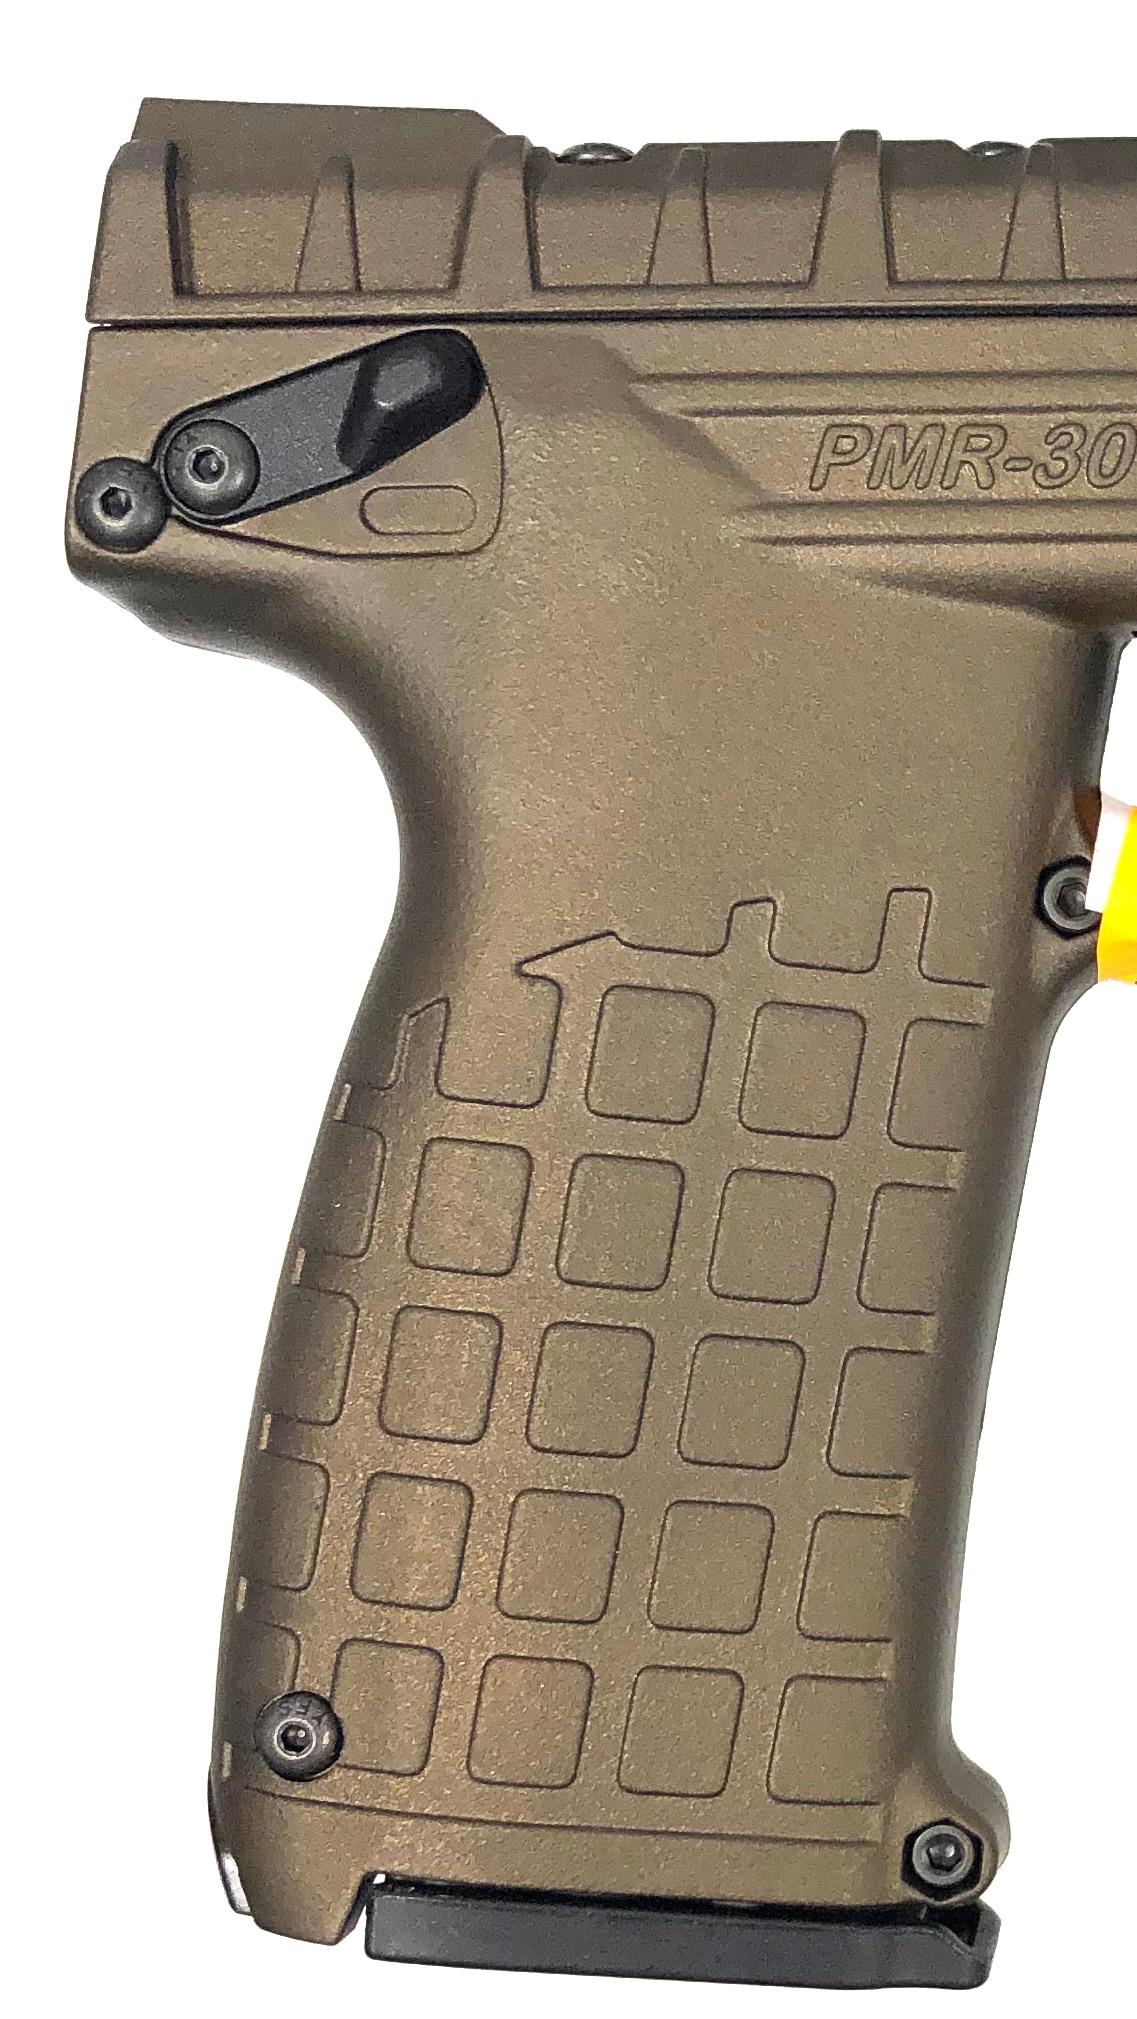 KEL-TEC PMR-30 - PMR30MDBRZ